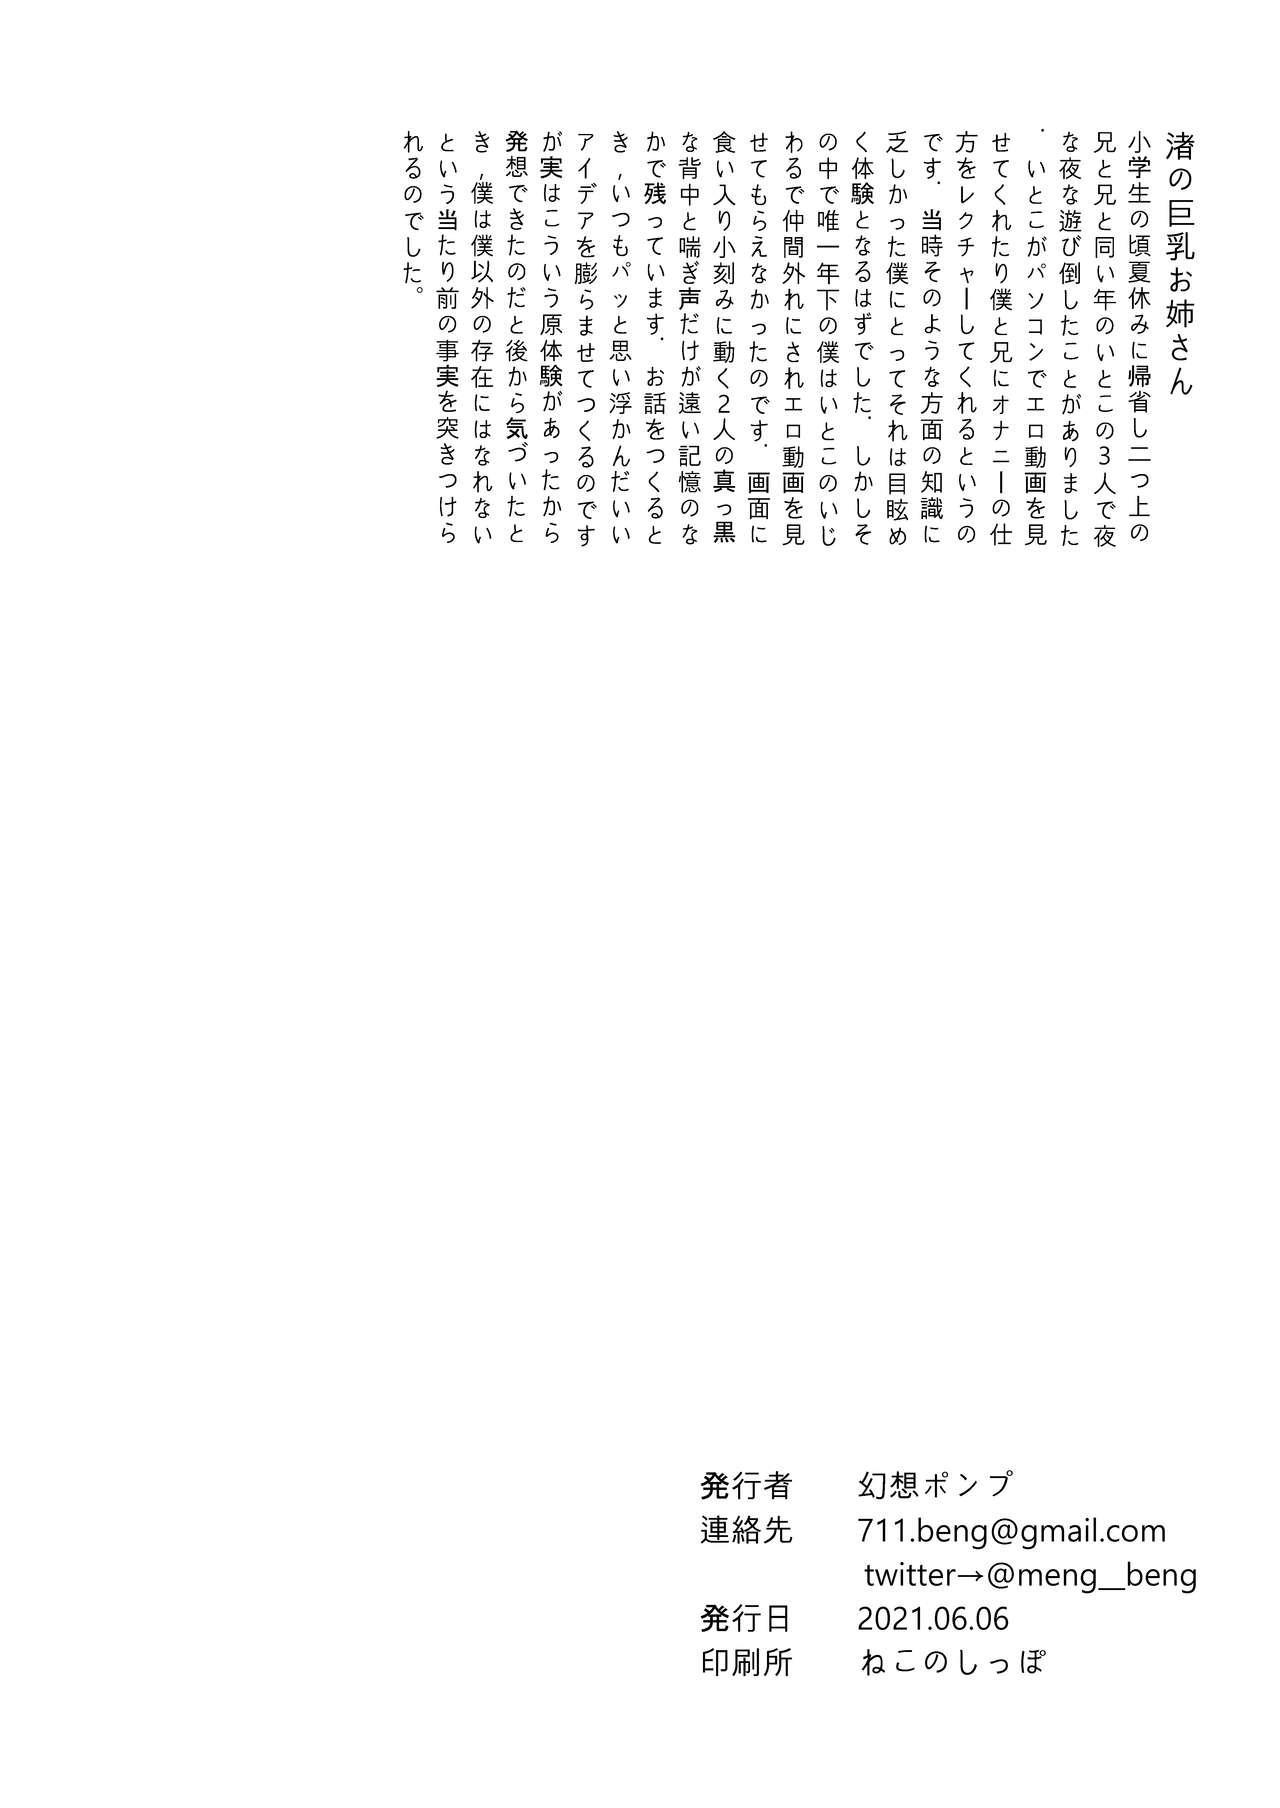 Nagisa no Kyonyuu Onee-san 24